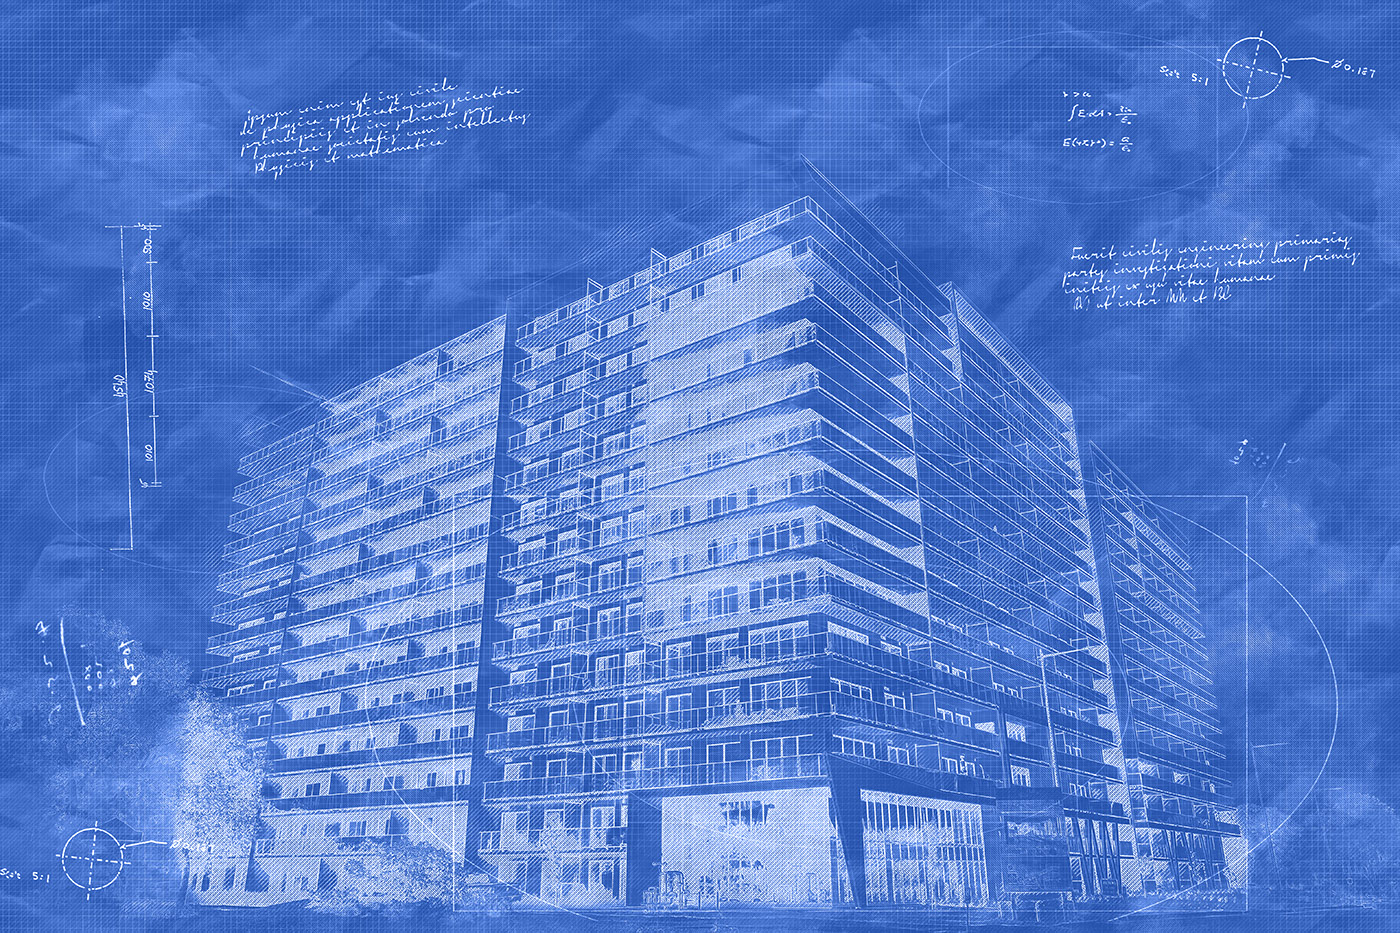 Large Condominium Building Sketch Blueprint Image - Stock Photos, Pictures & Images